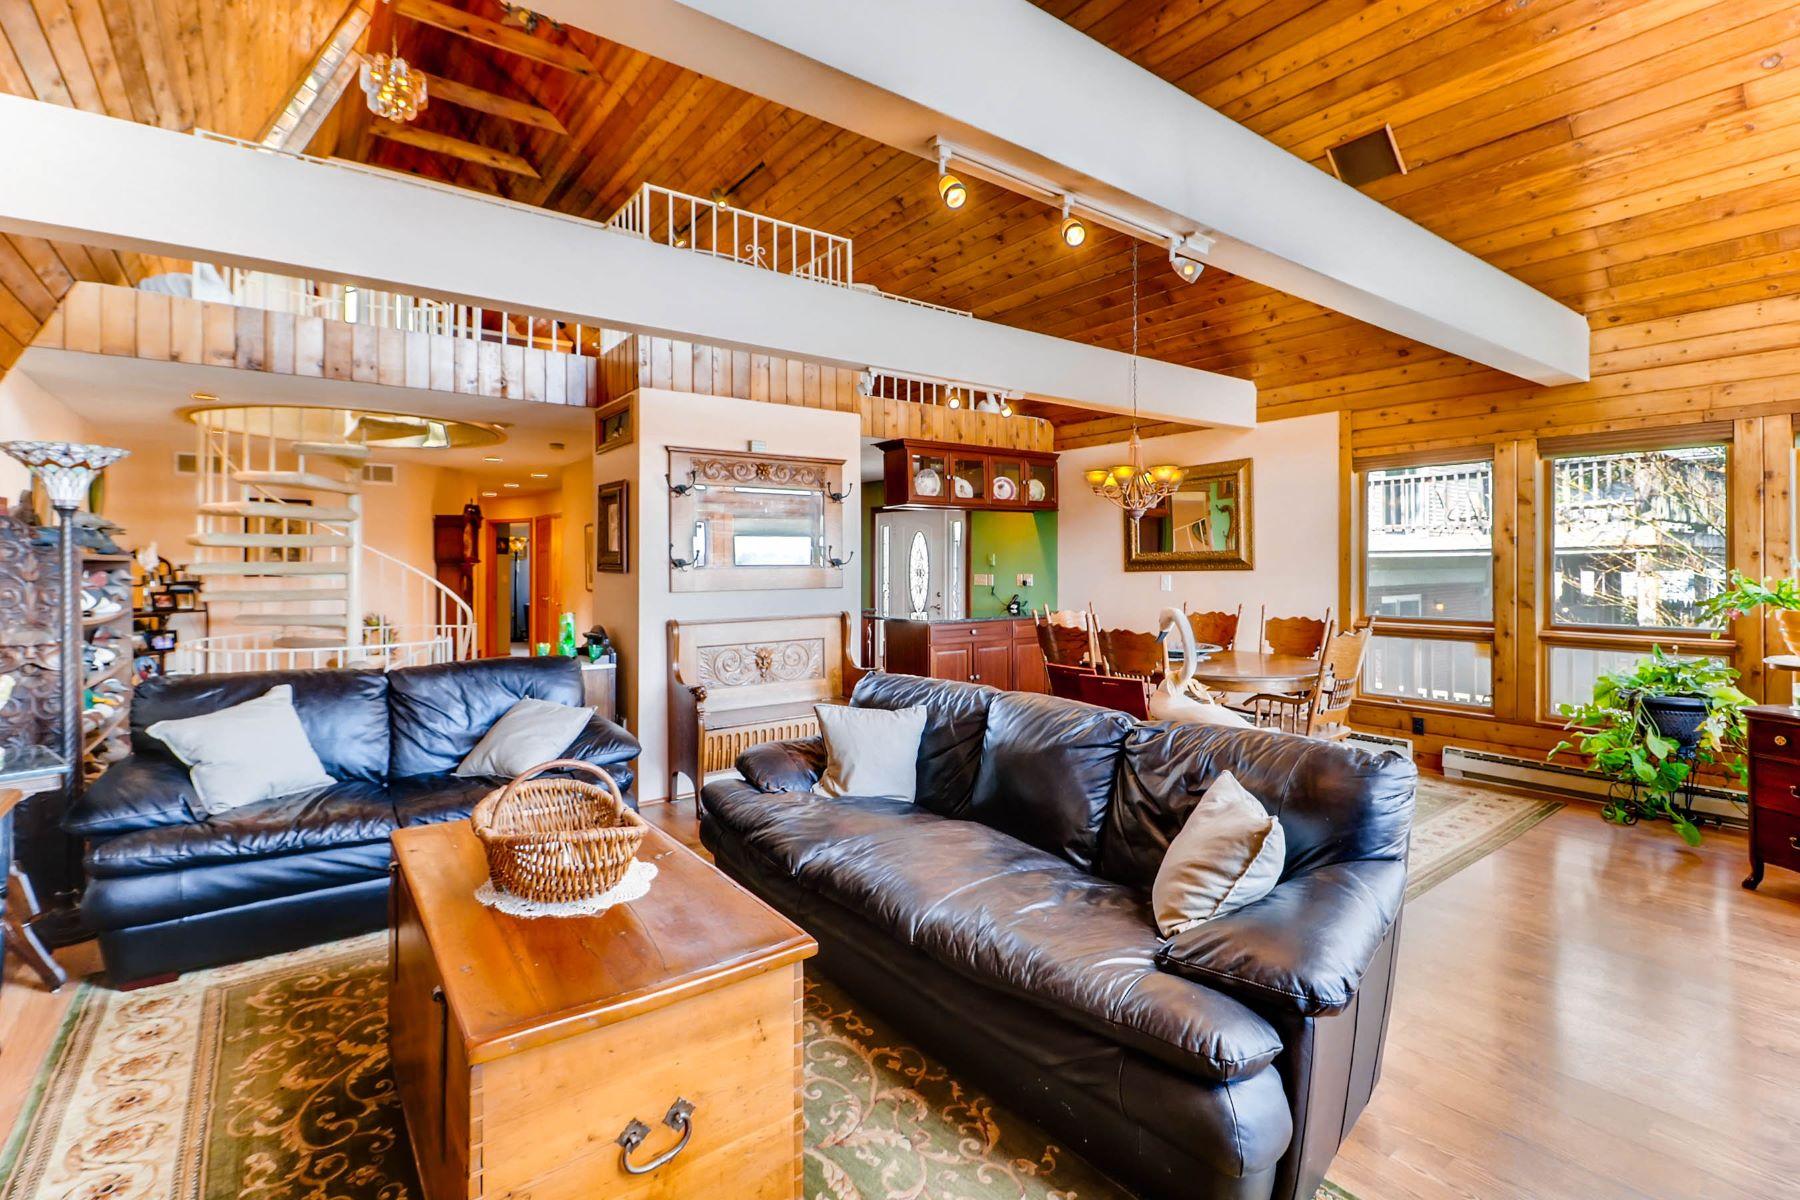 Additional photo for property listing at Long Bar Harbor 4011A Baker Avenue, Abingdon, Maryland 21009 Hoa Kỳ